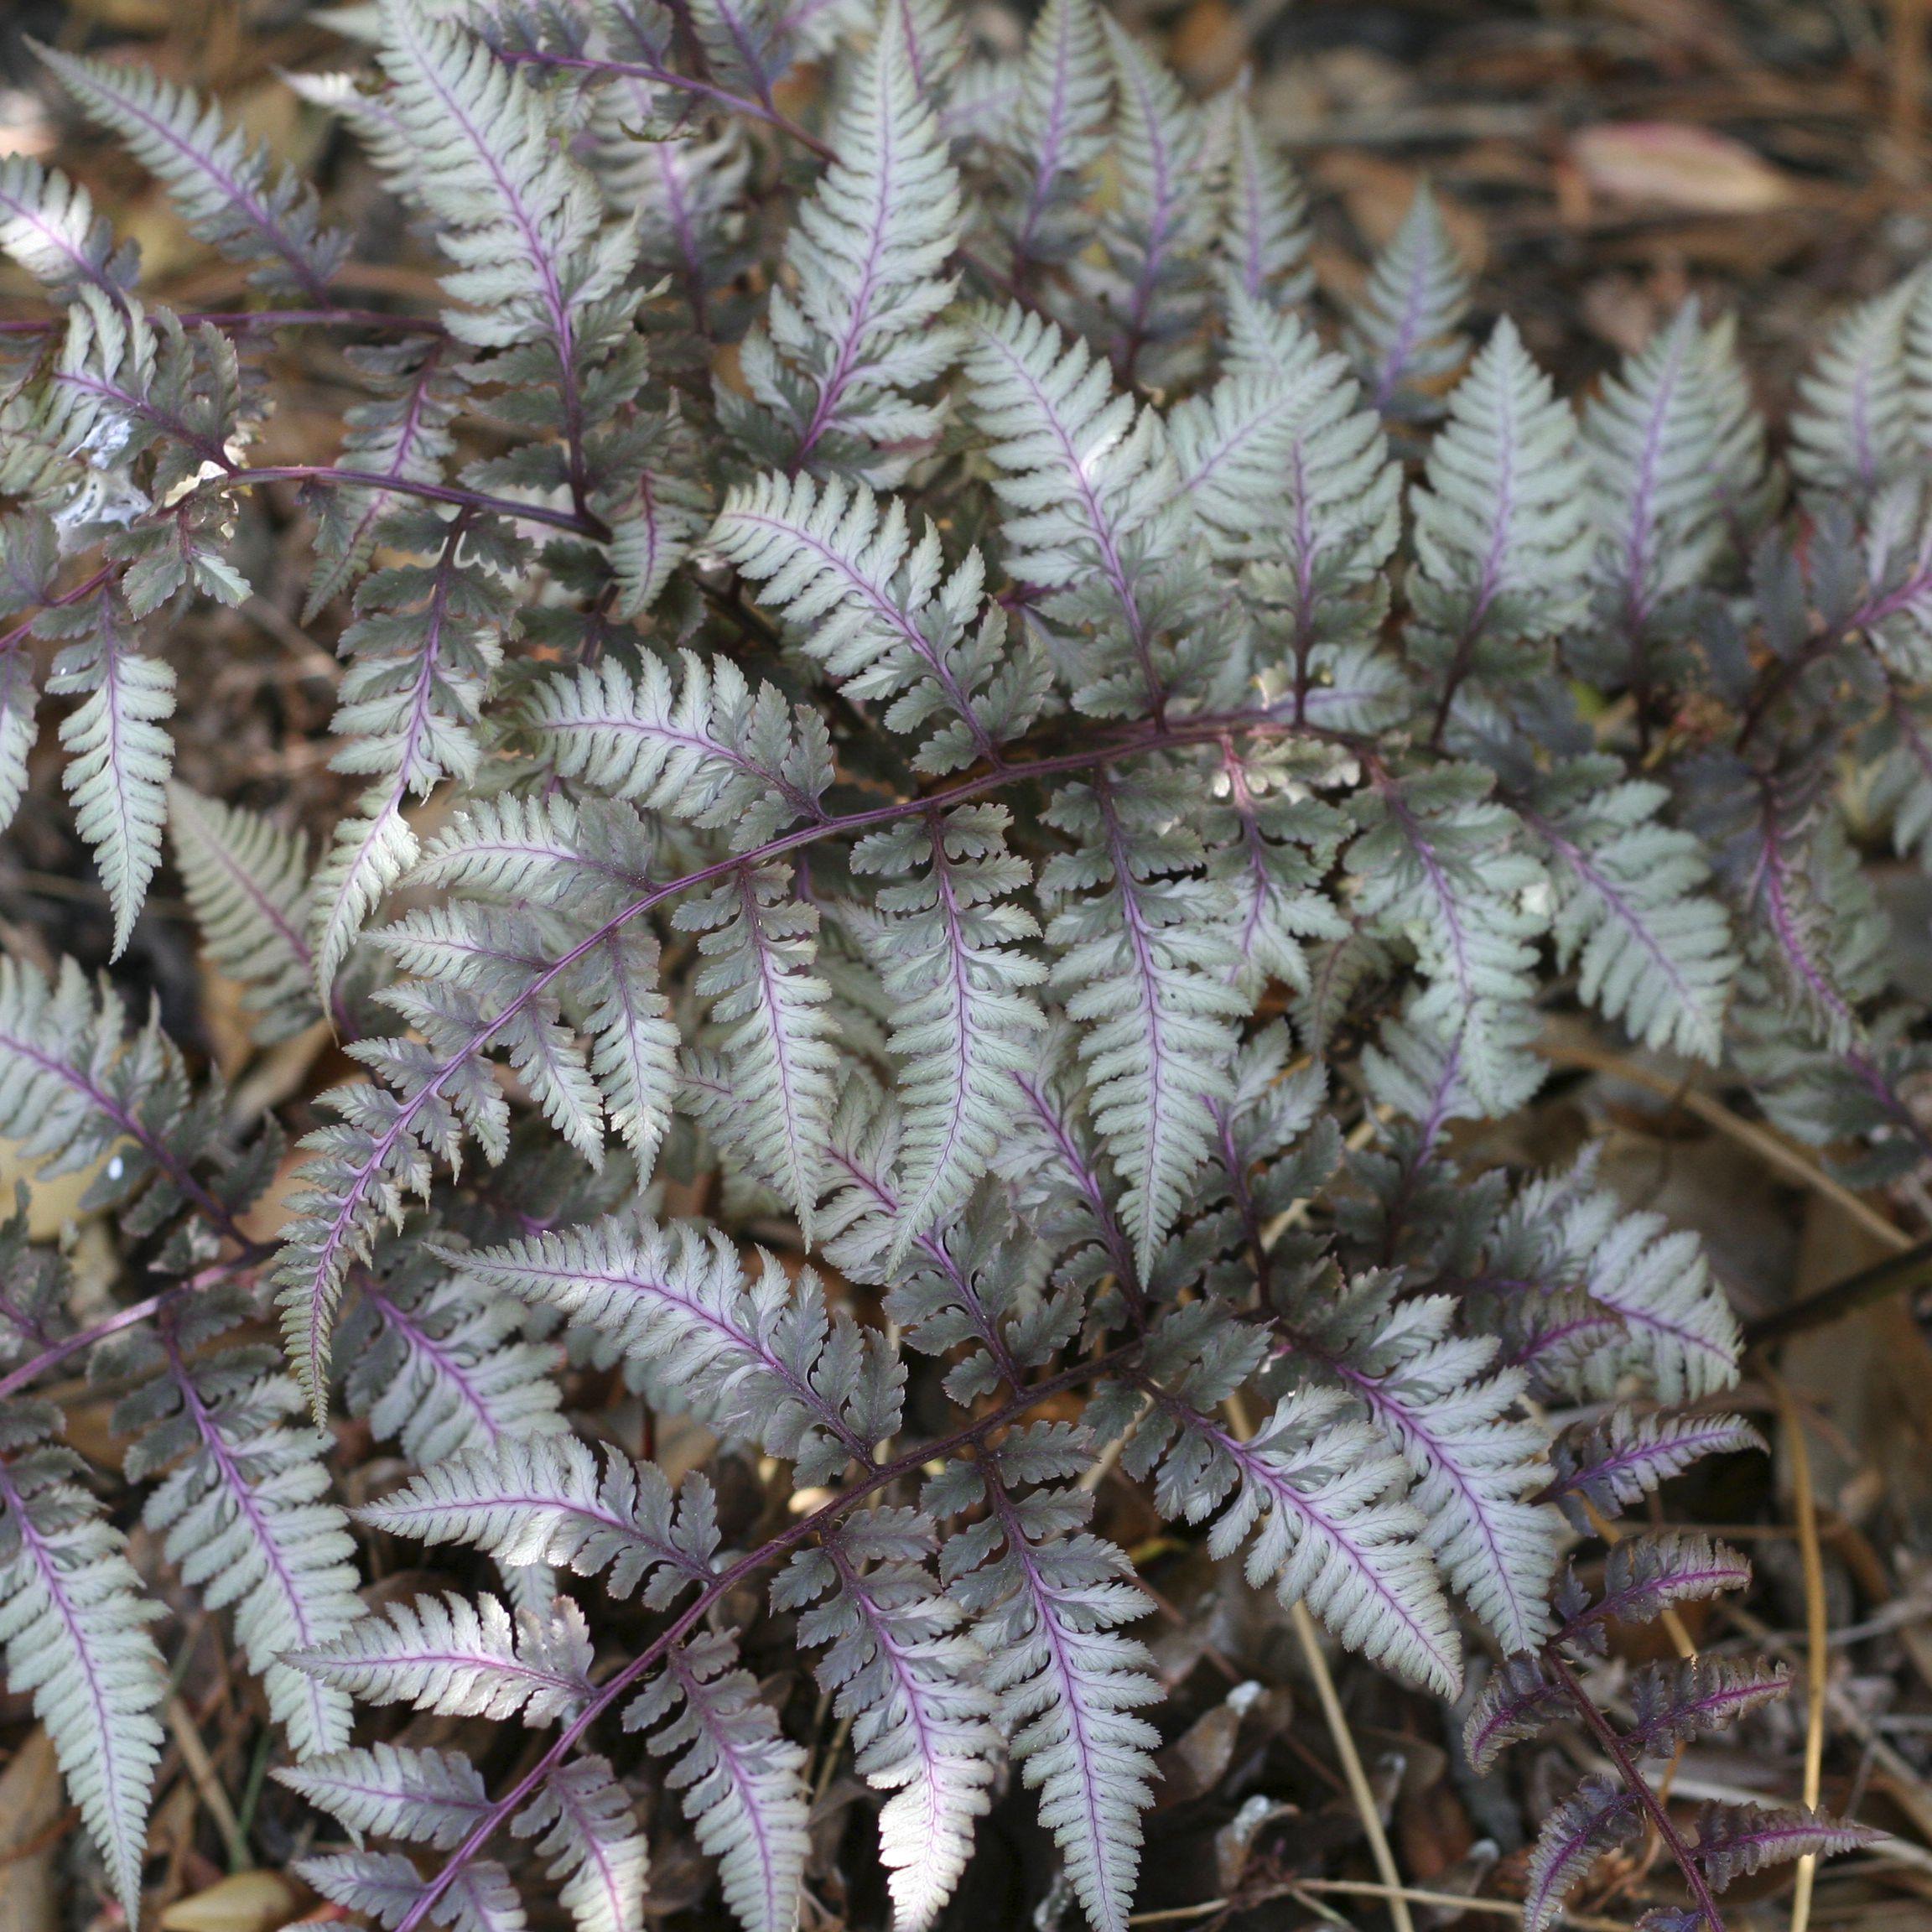 Japanese Painted Fern Plant Profile